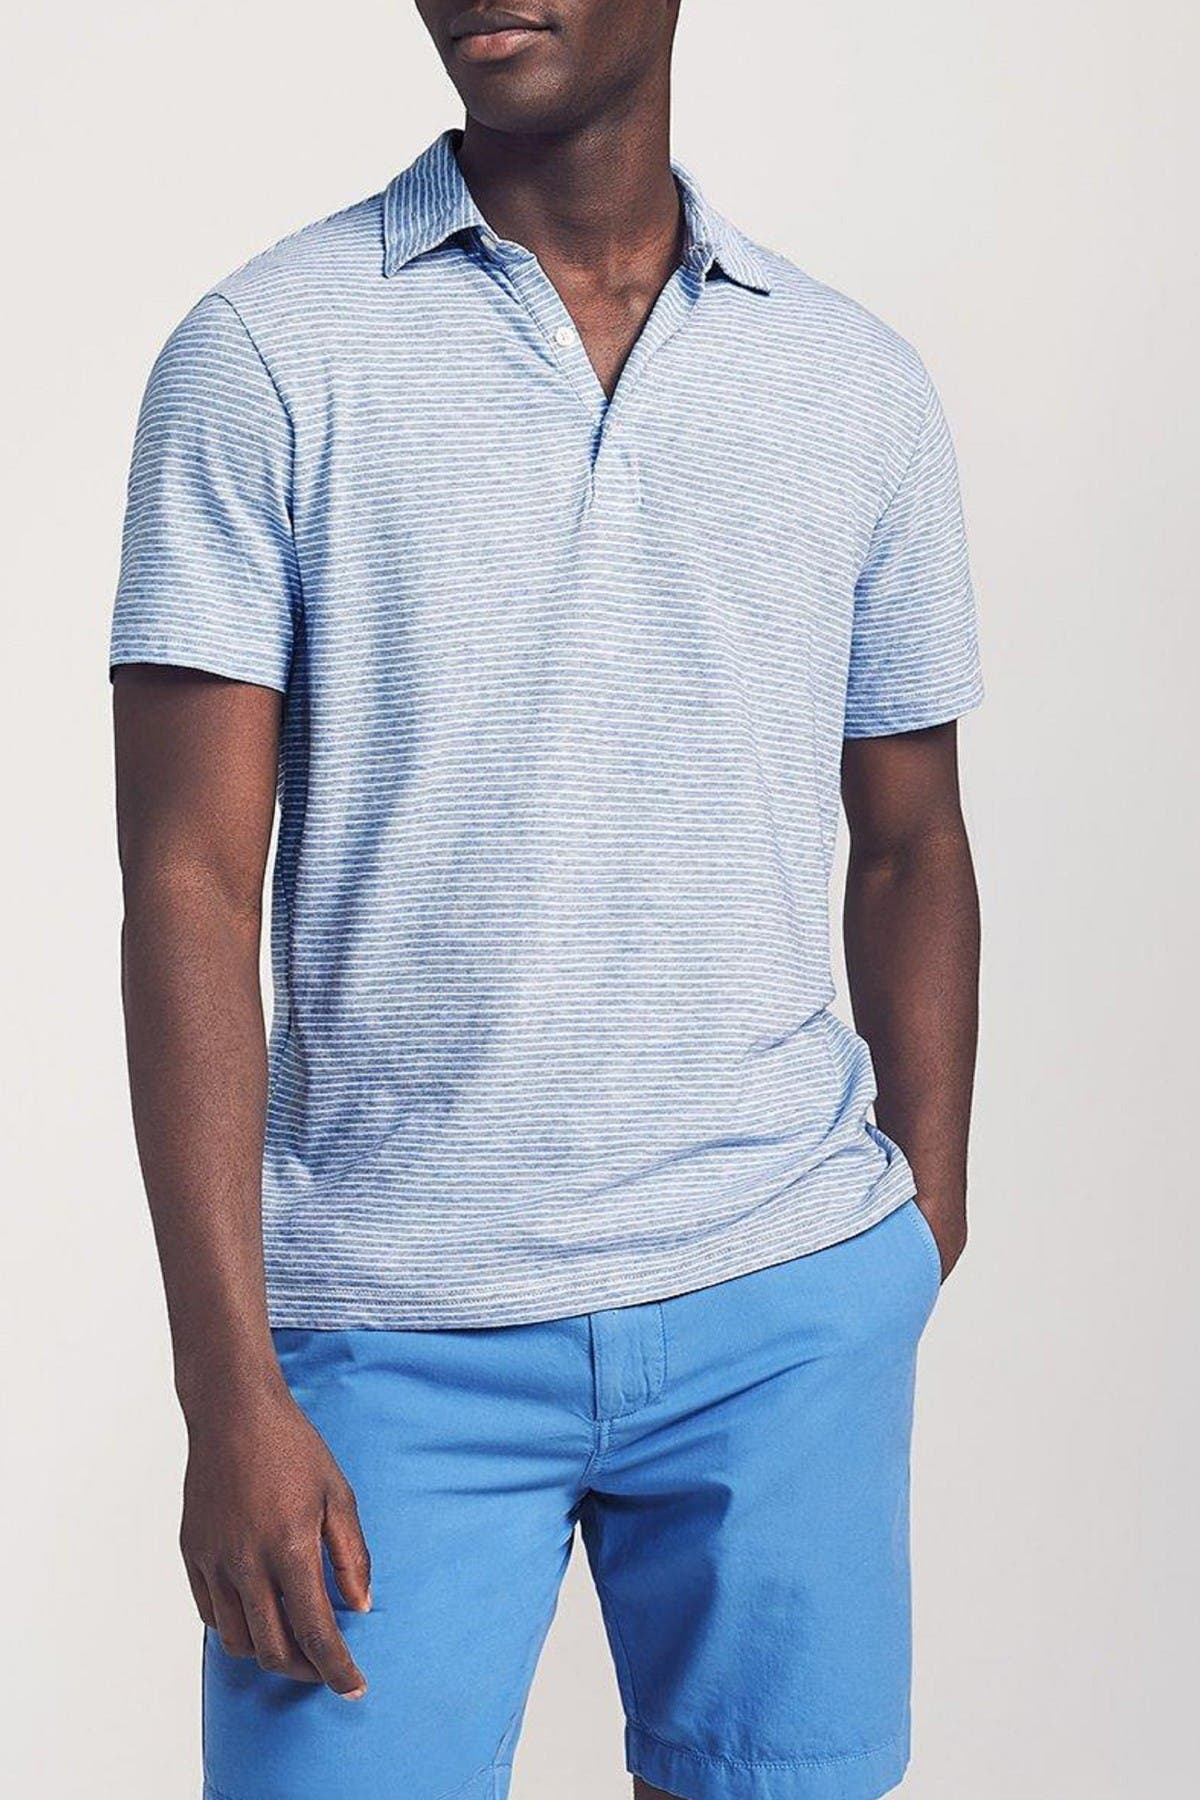 Image of FAHERTY BRAND Isle Stripe Short Sleeve Polo Shirt